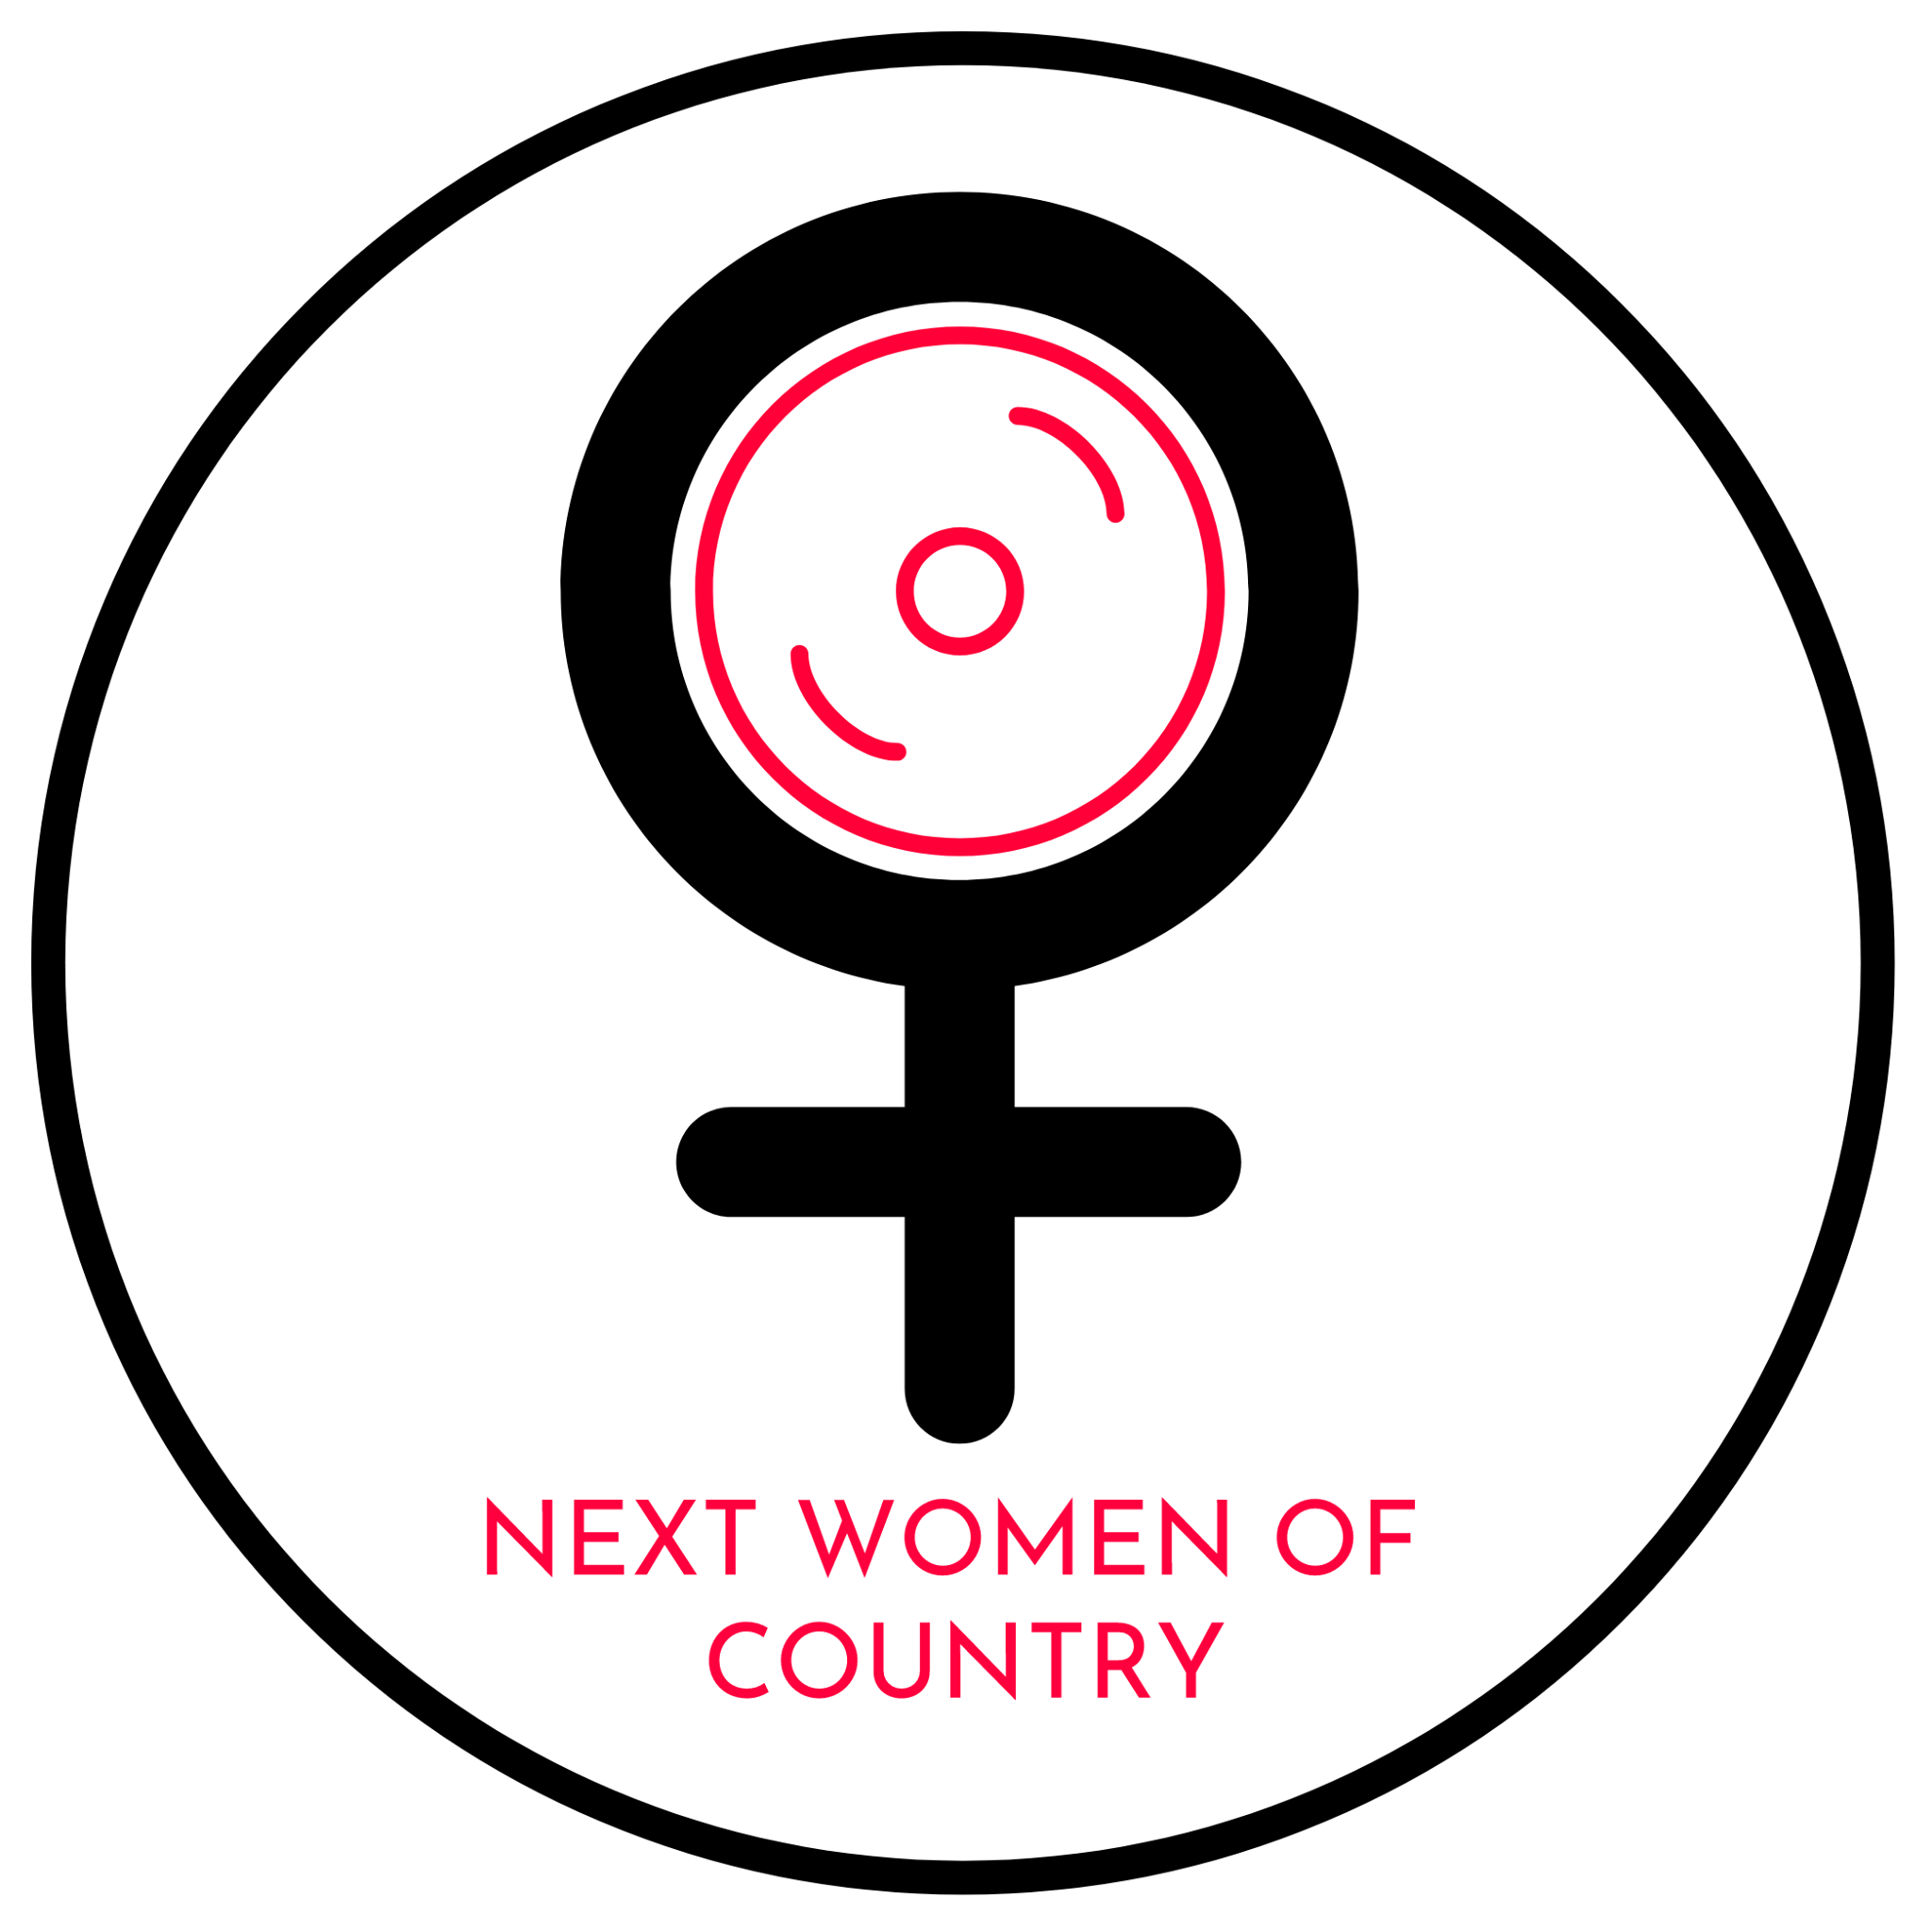 Next Women of Country - Stephanie Owens Writes To Encourage Girls to Appreciate their True Selves